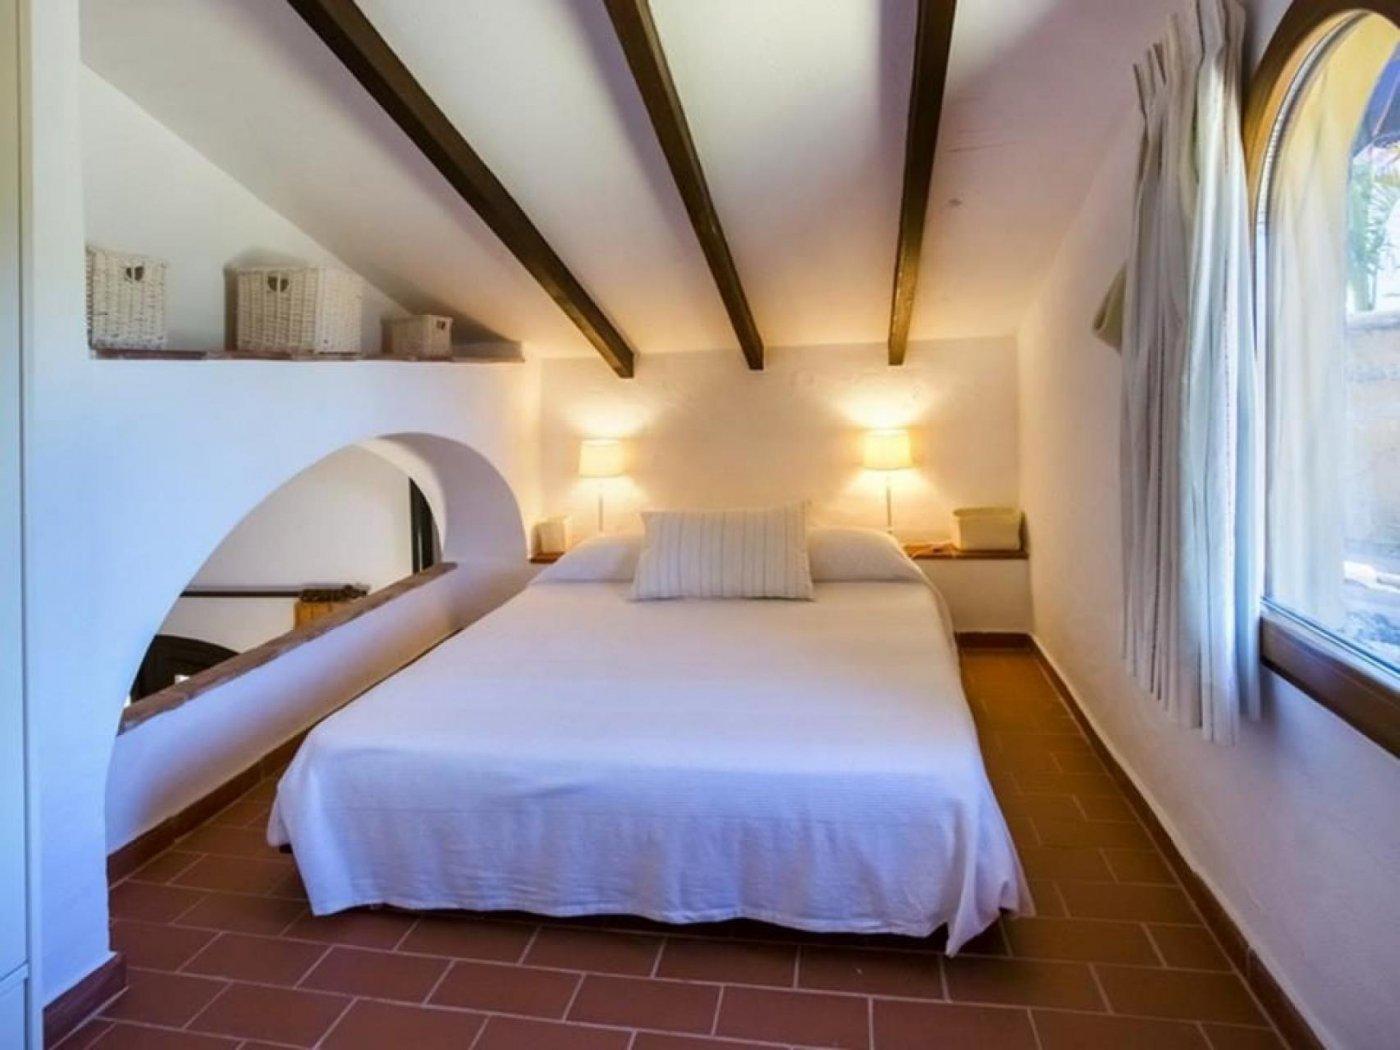 Estate Agents Moraira – Property for sale in Moraira – Country Estate – TEULADA – Teulada